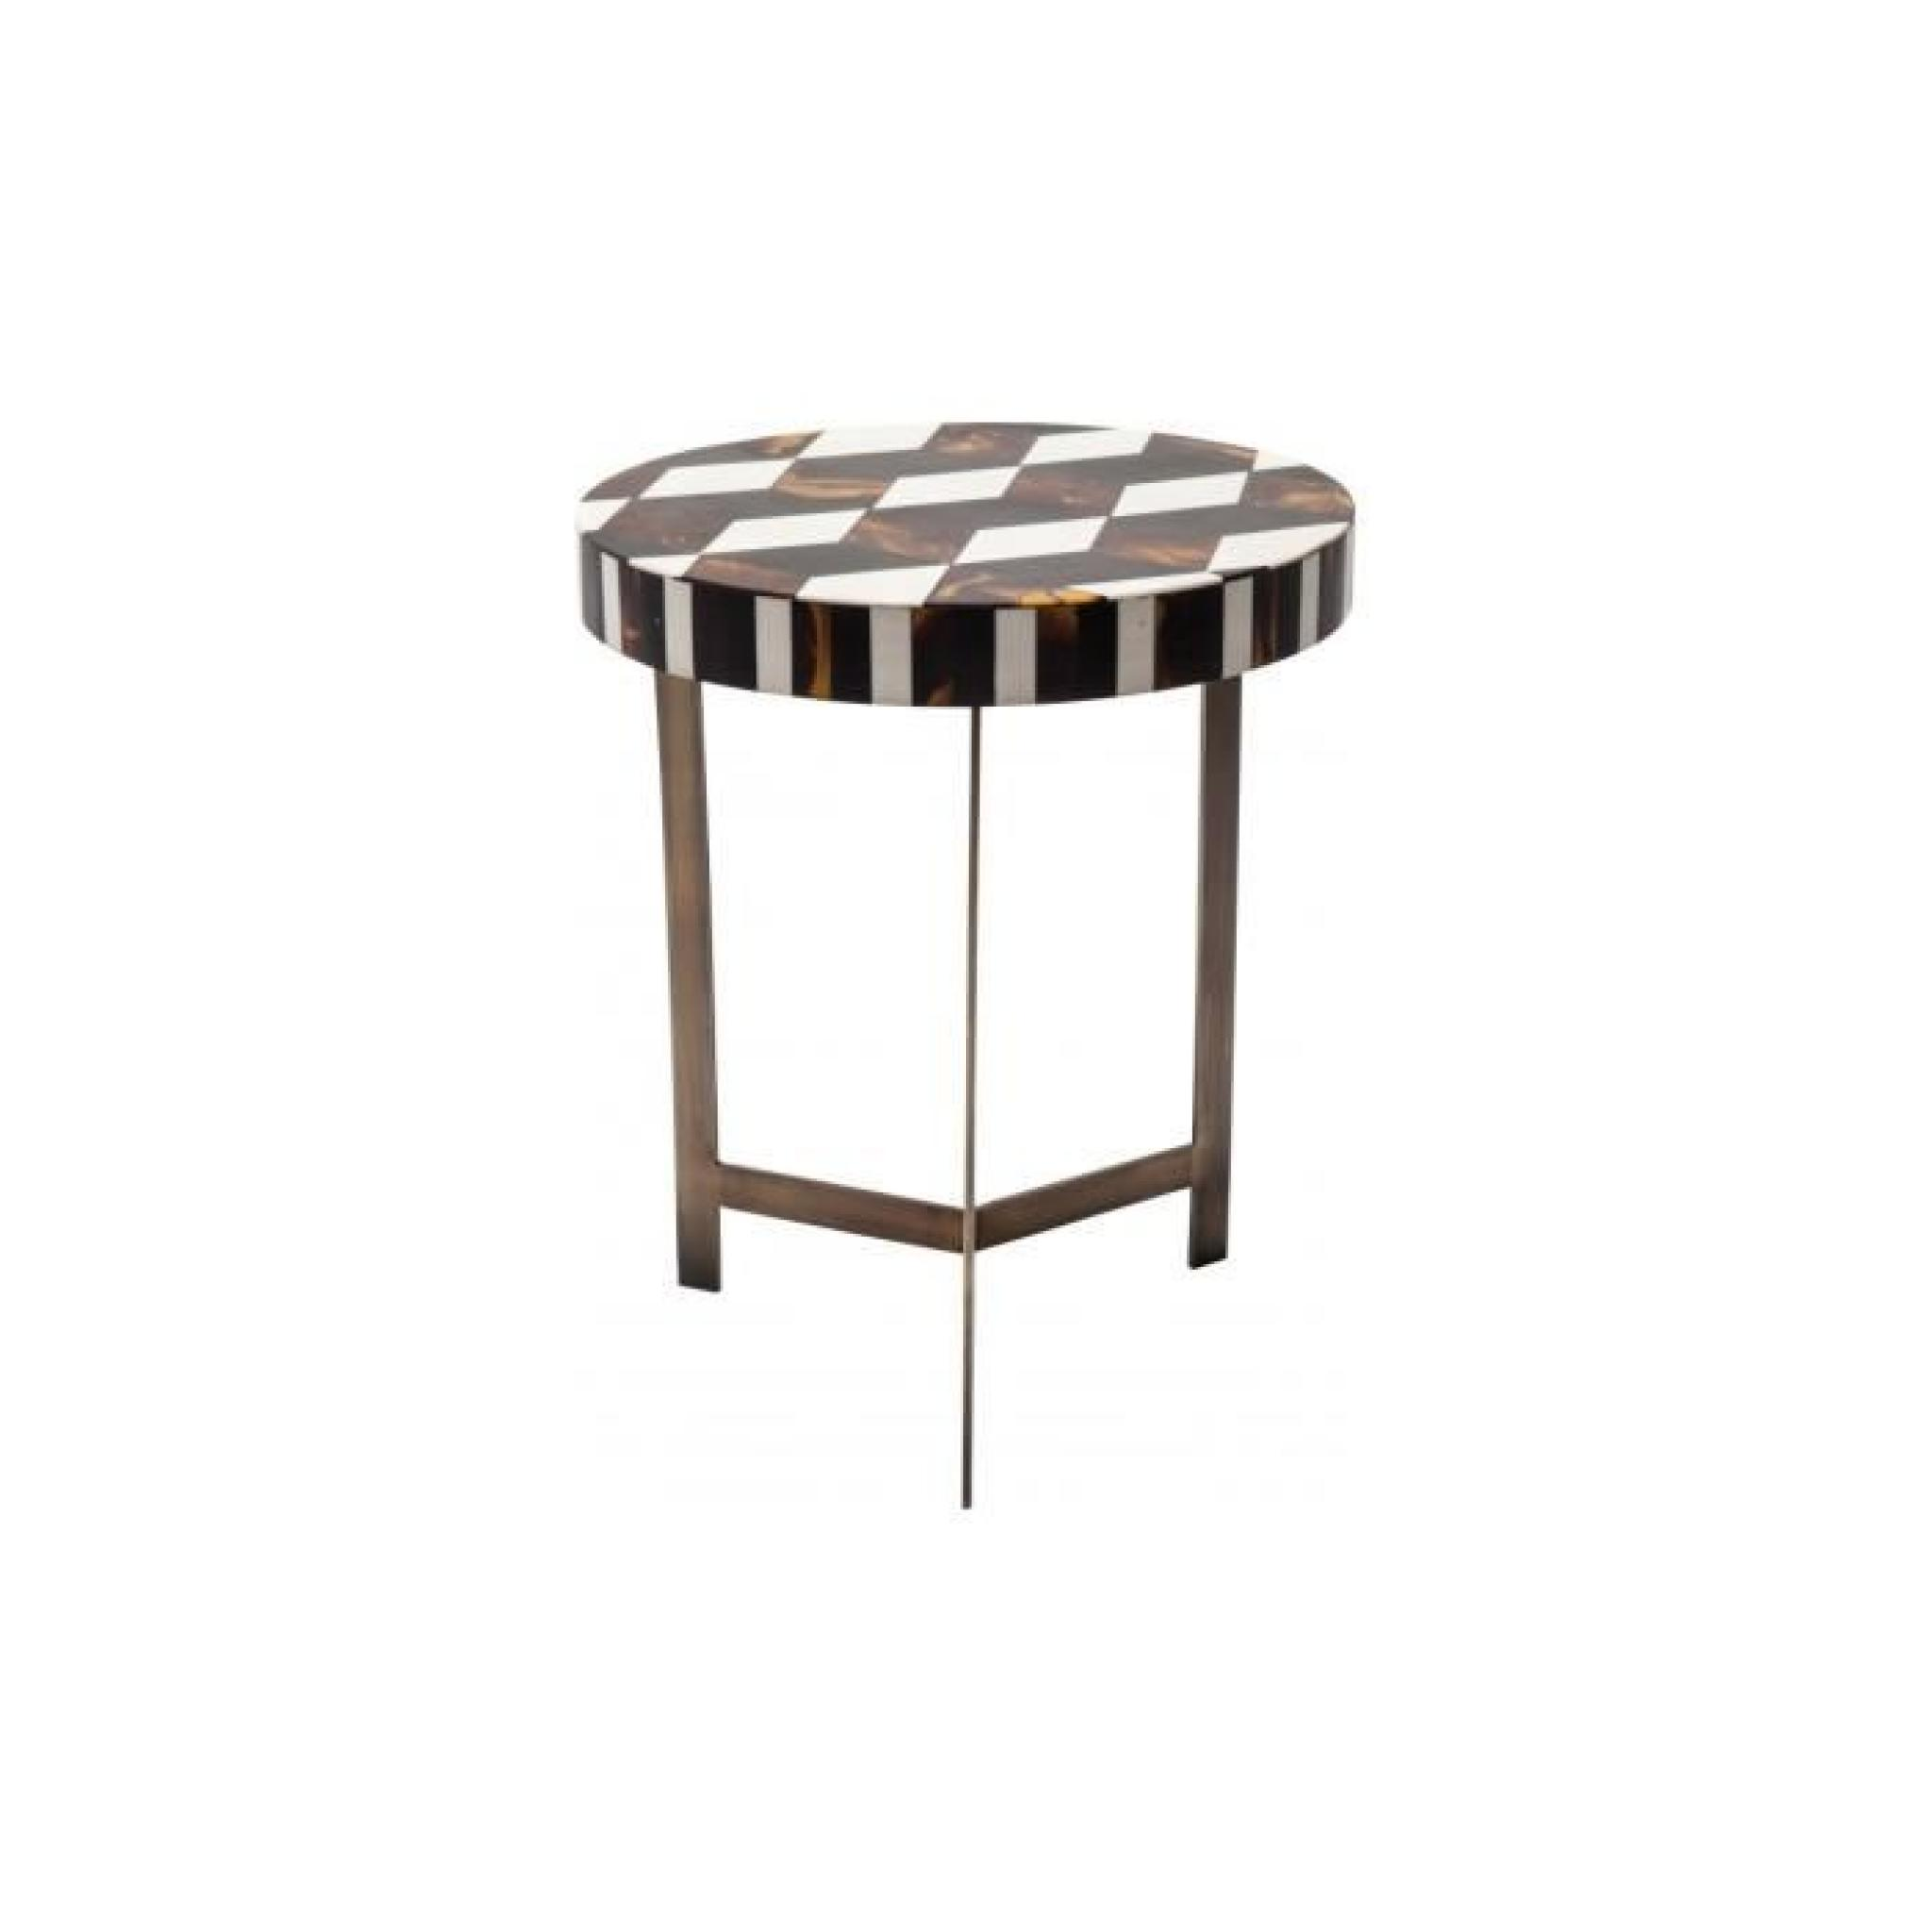 5592bb7e53c977 Table Basse Musivo Round 4 set Kare Design - Achat Vente table basse ...